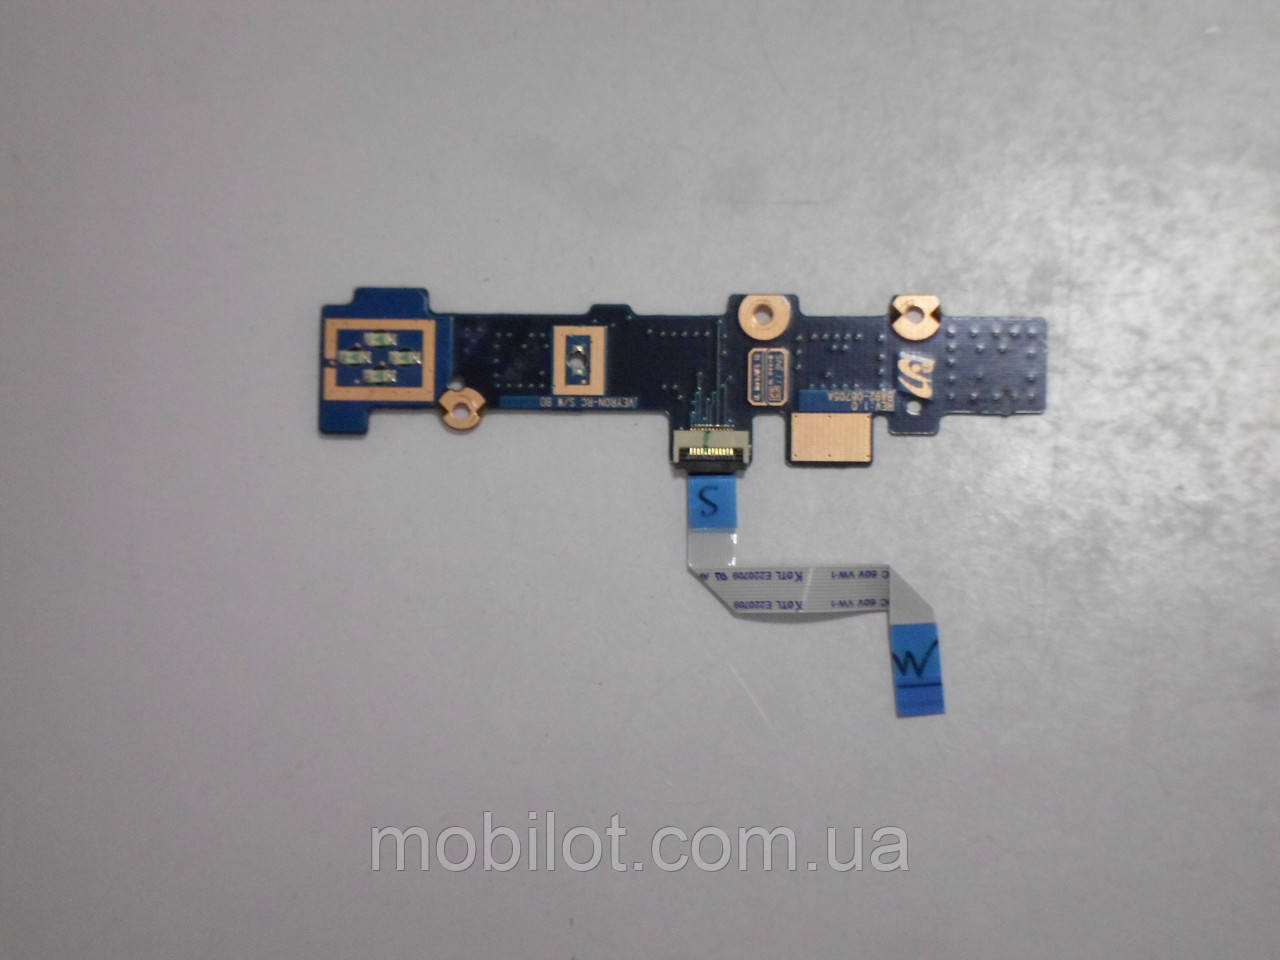 Кнопка включения  Samsung RC530 (NZ-456)